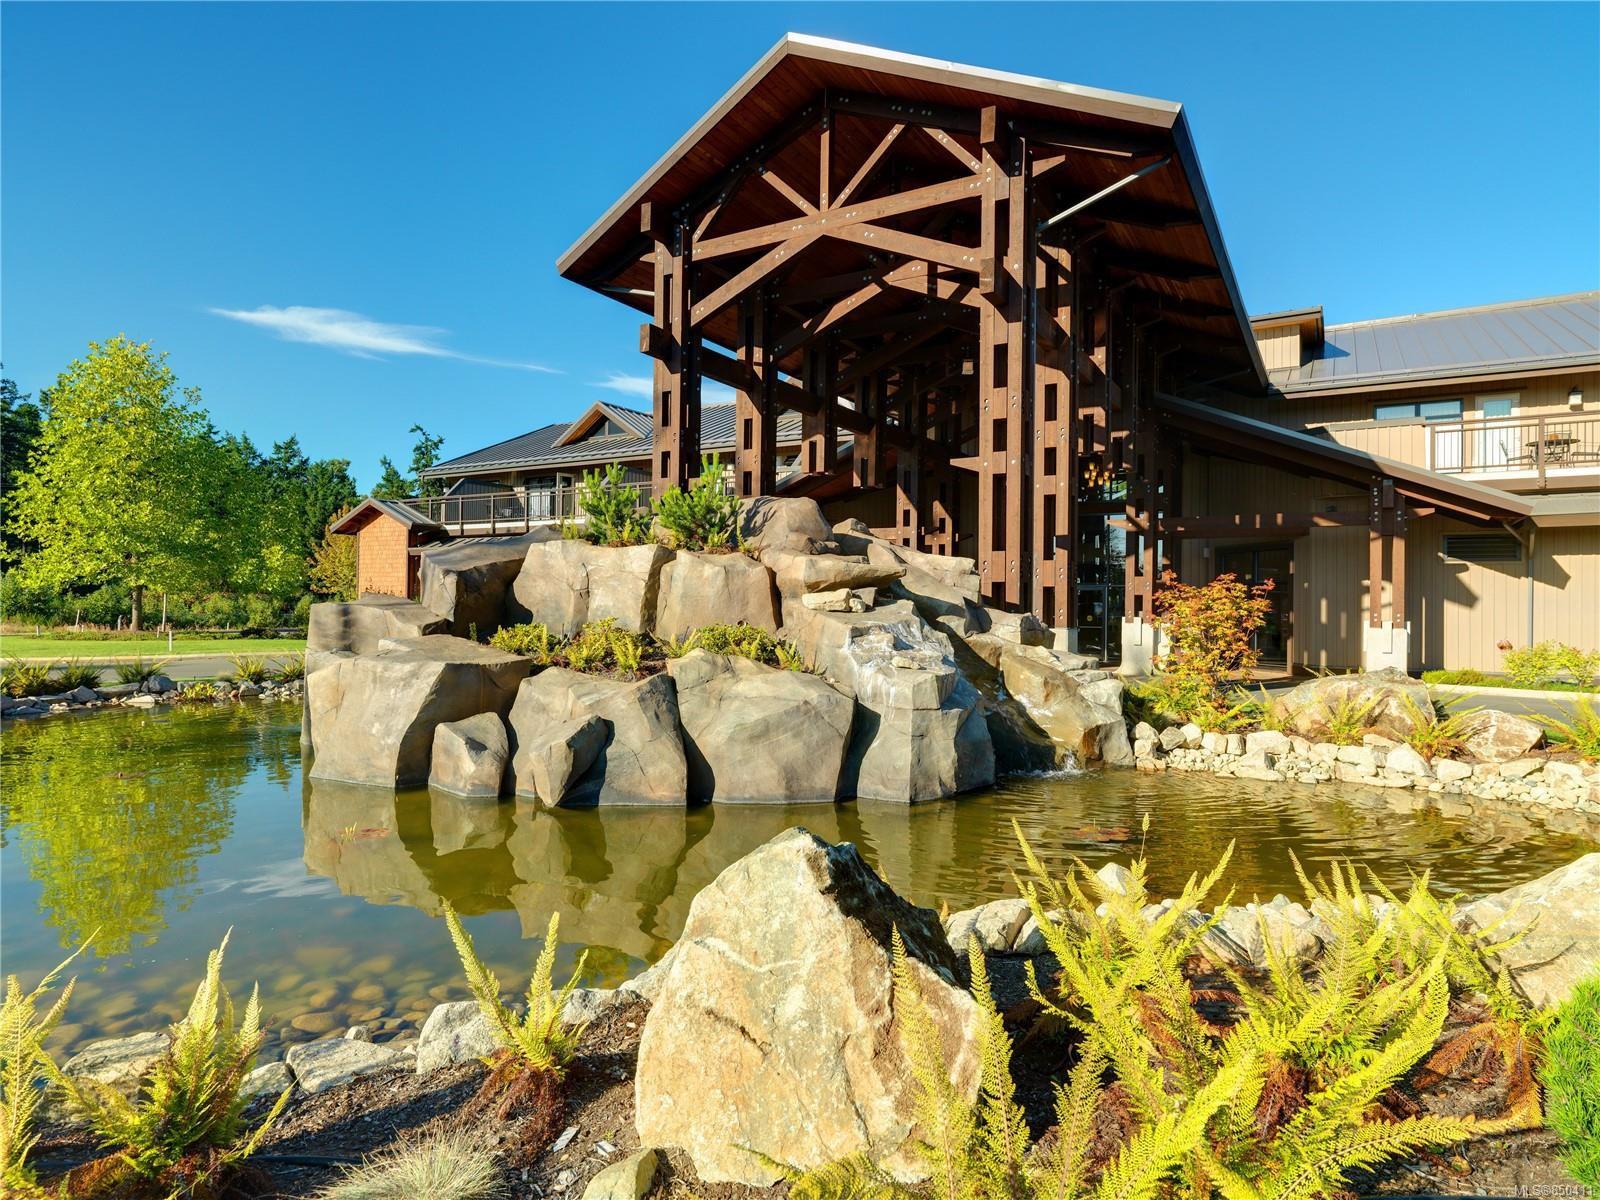 Main Photo: SL44 1175 Resort Dr in : PQ Parksville Condo Apartment for sale (Parksville/Qualicum)  : MLS®# 850411